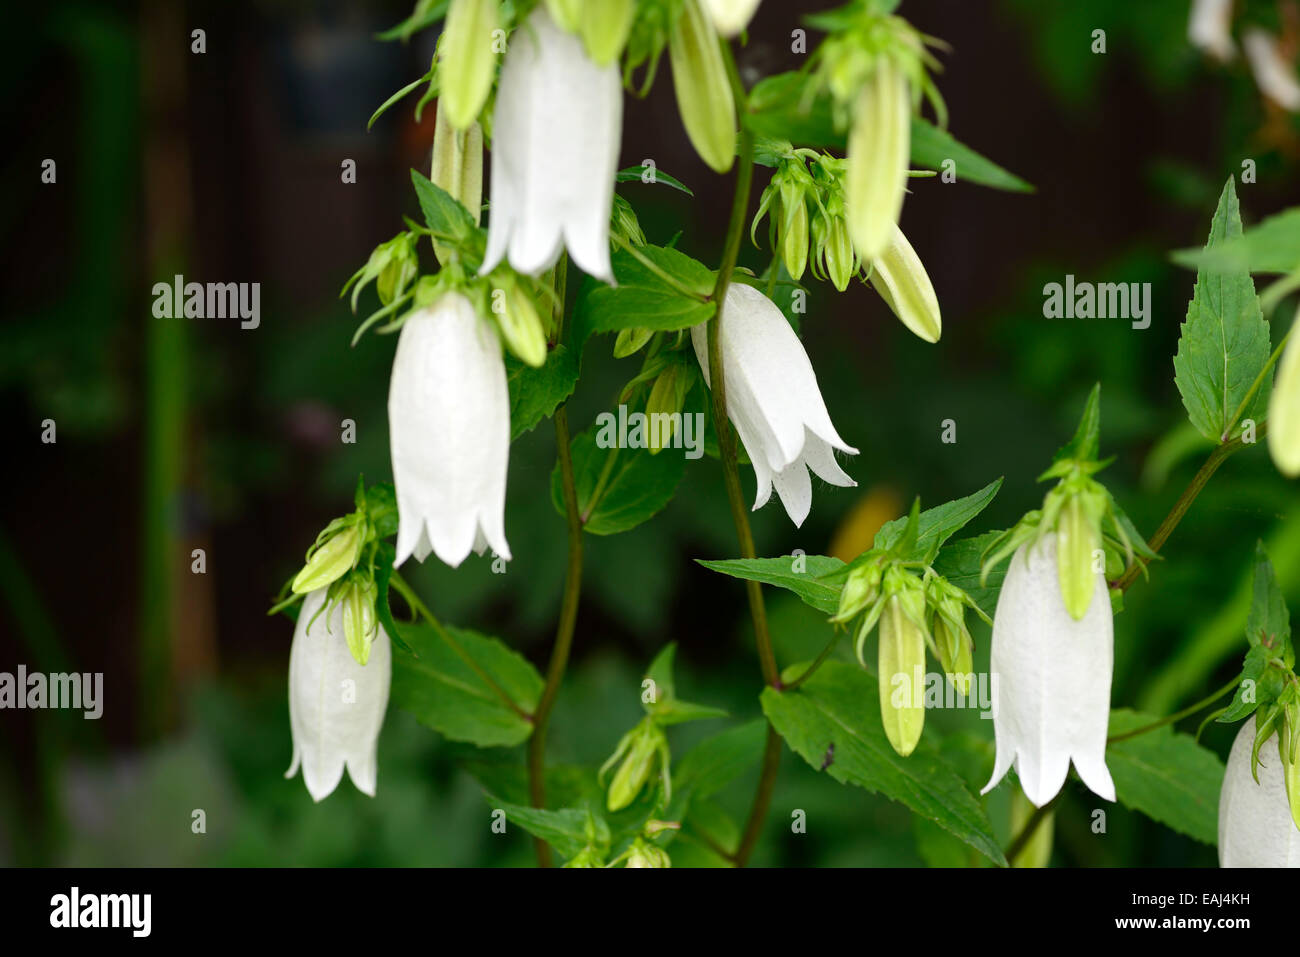 Campanula takesimana alba white bellflower flowers bell shaped stock campanula takesimana alba white bellflower flowers bell shaped herbaceous perennial korean bellflowers rm floral mightylinksfo Choice Image